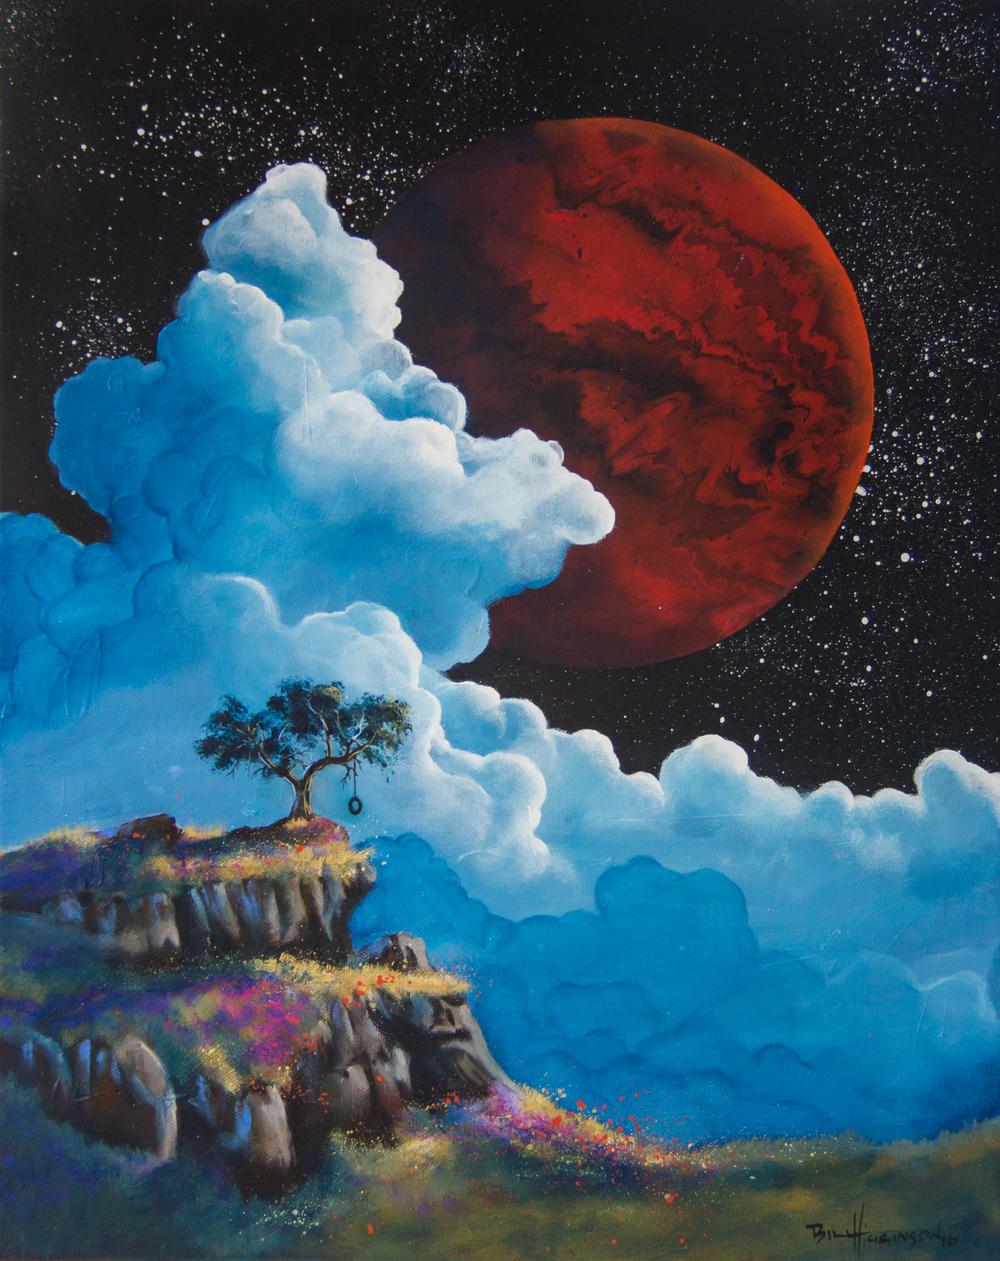 bill-higginson/art/red-moon-rising/fantasy-landscape-surrealism